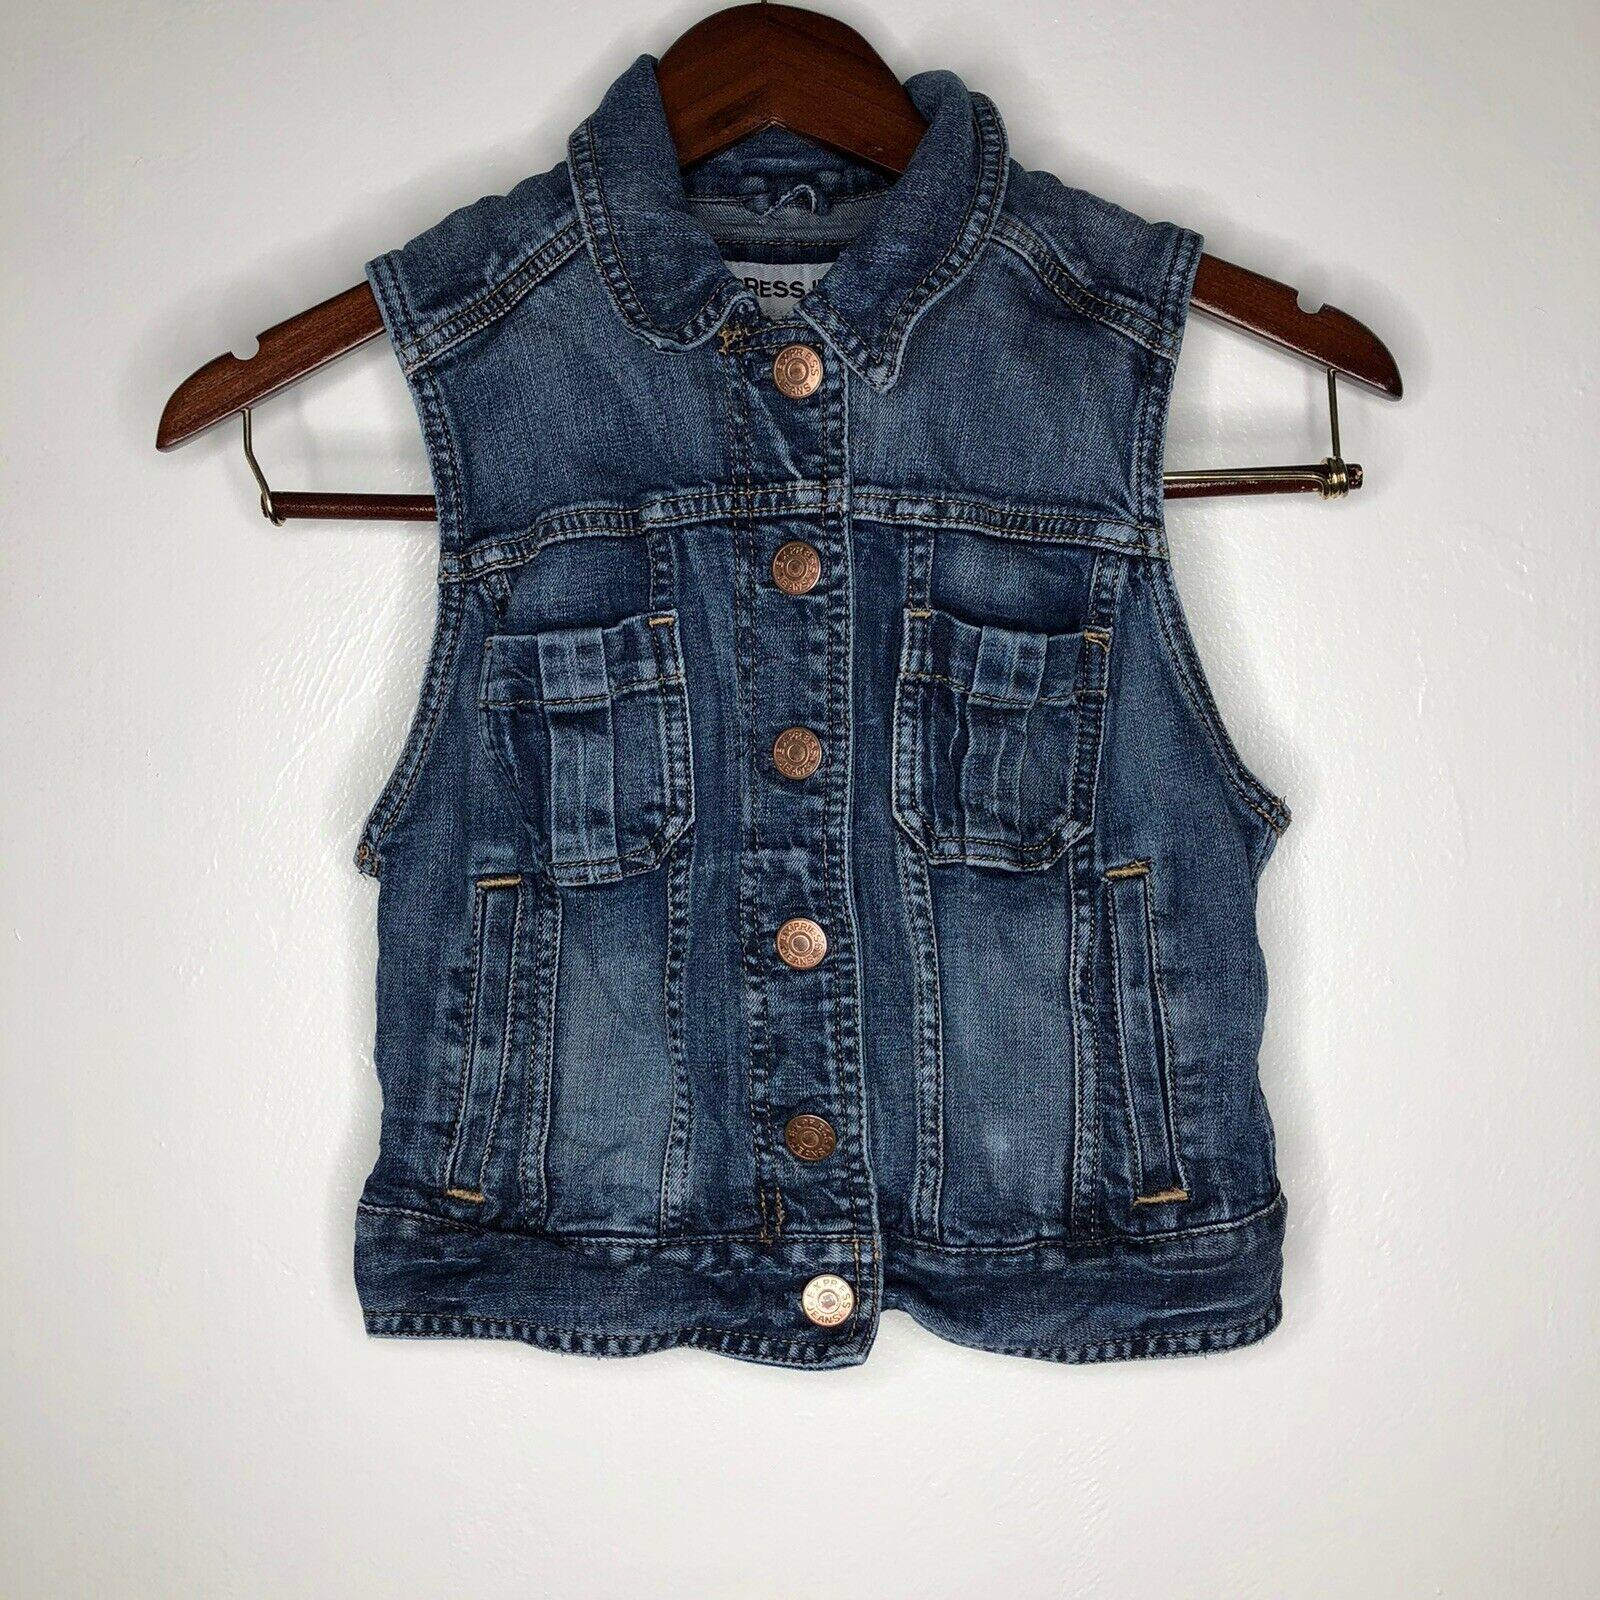 Express Womens Medium Wash Denim Vest Size Xs Sleeveless Jean Jacket 24 00 Women Jean Jackets Ideas Sleeveless Jean Jackets Denim Vest Medium Wash Denim [ 1600 x 1600 Pixel ]